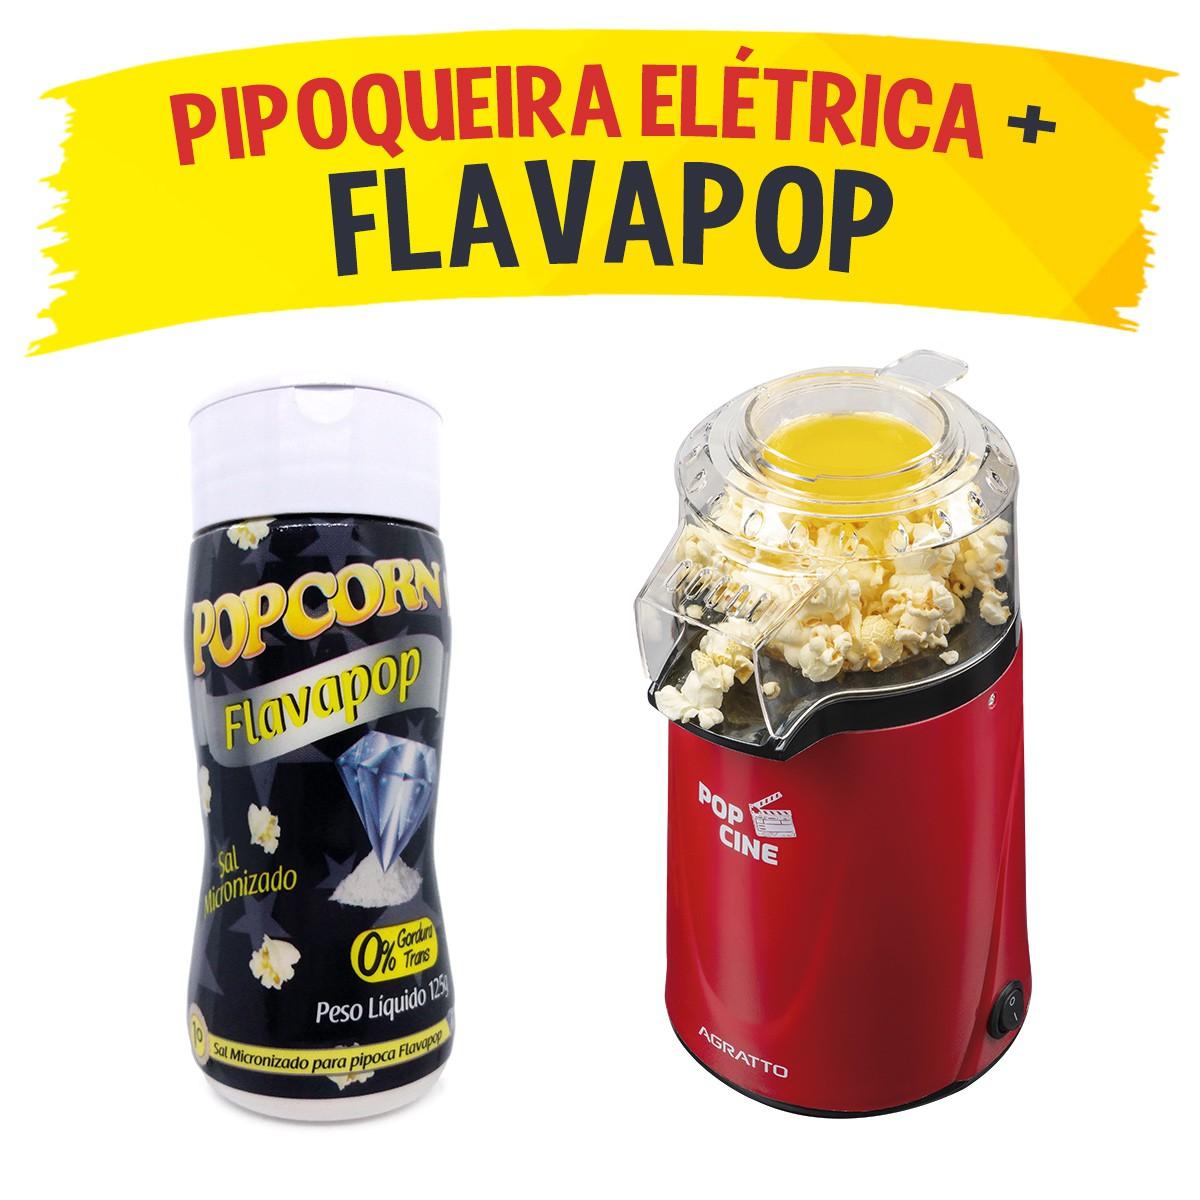 Pipoqueira Elétrica POP CINE + Flavapop